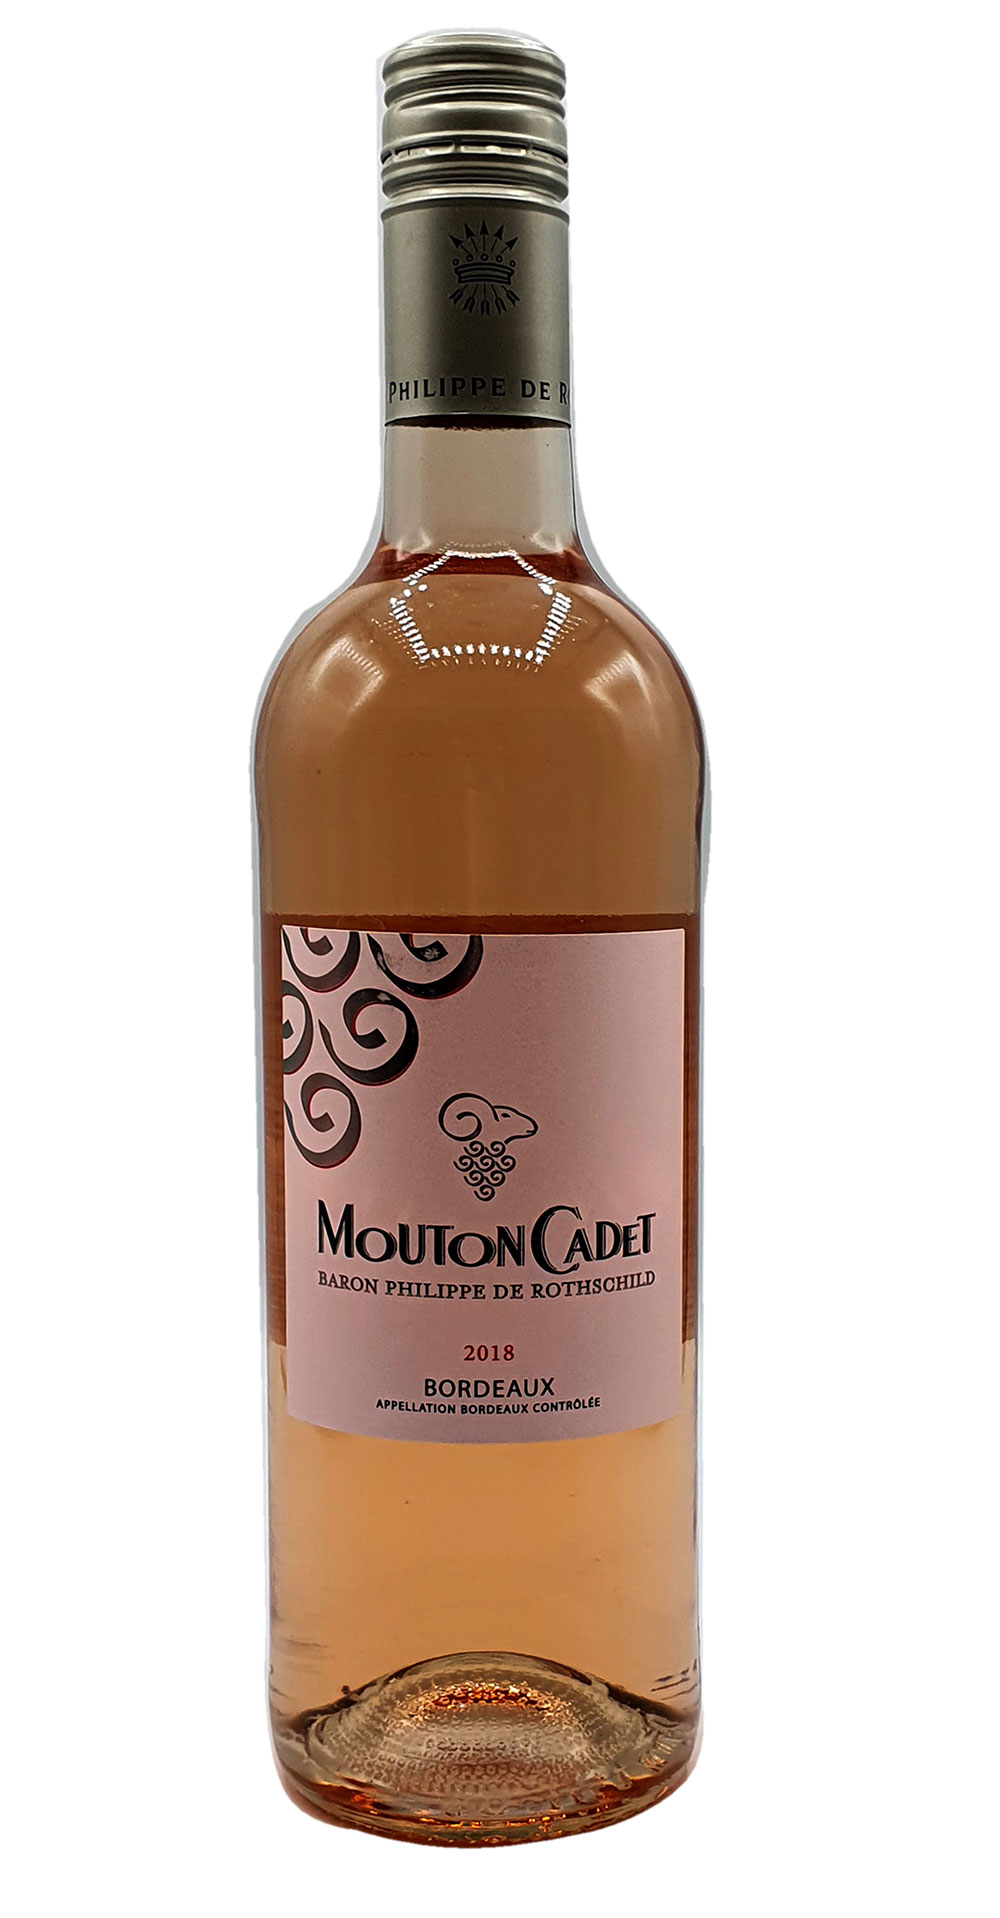 Rose Wein - Mouton Cadet Bordeaux / Baron Philippe De Rothschild 750ml (12% Vol)- [Enthält Sulfite]